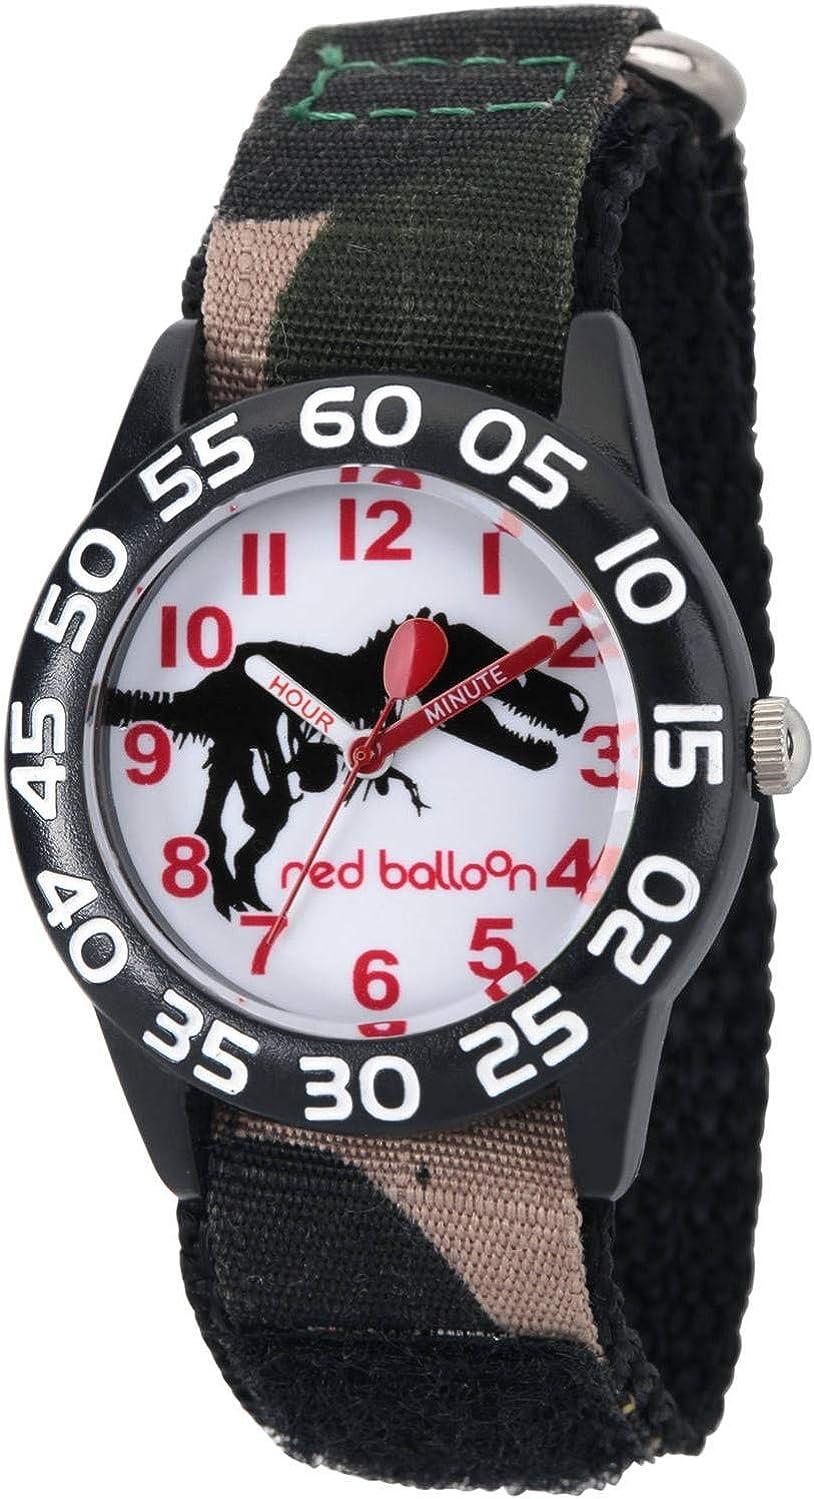 eWatchFactory Boys' Red Balloon Analog-Quartz S with Watch Nylon Industry No. 1 Ranking TOP3